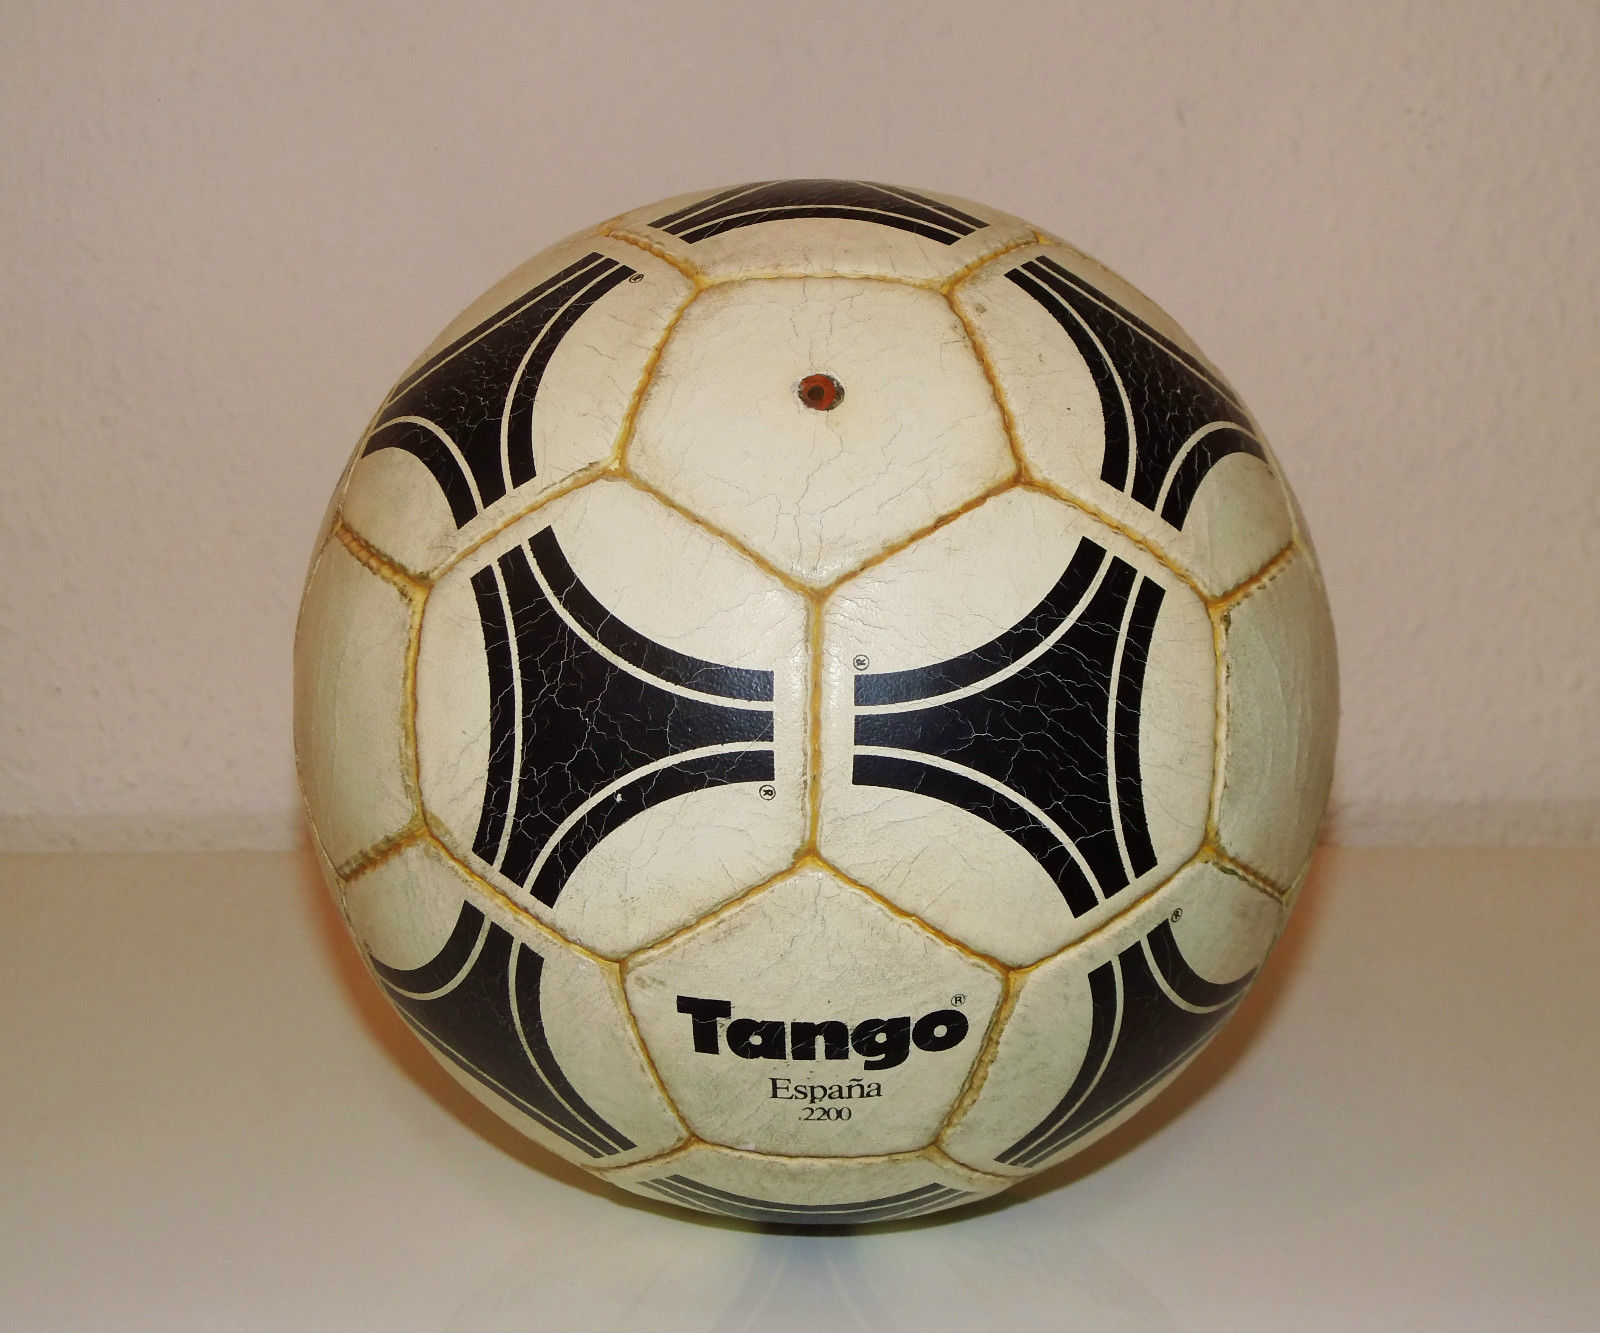 best supplier best online best online Balones de Epoca: Balón Adidas Tango España 2200. Mundial ...